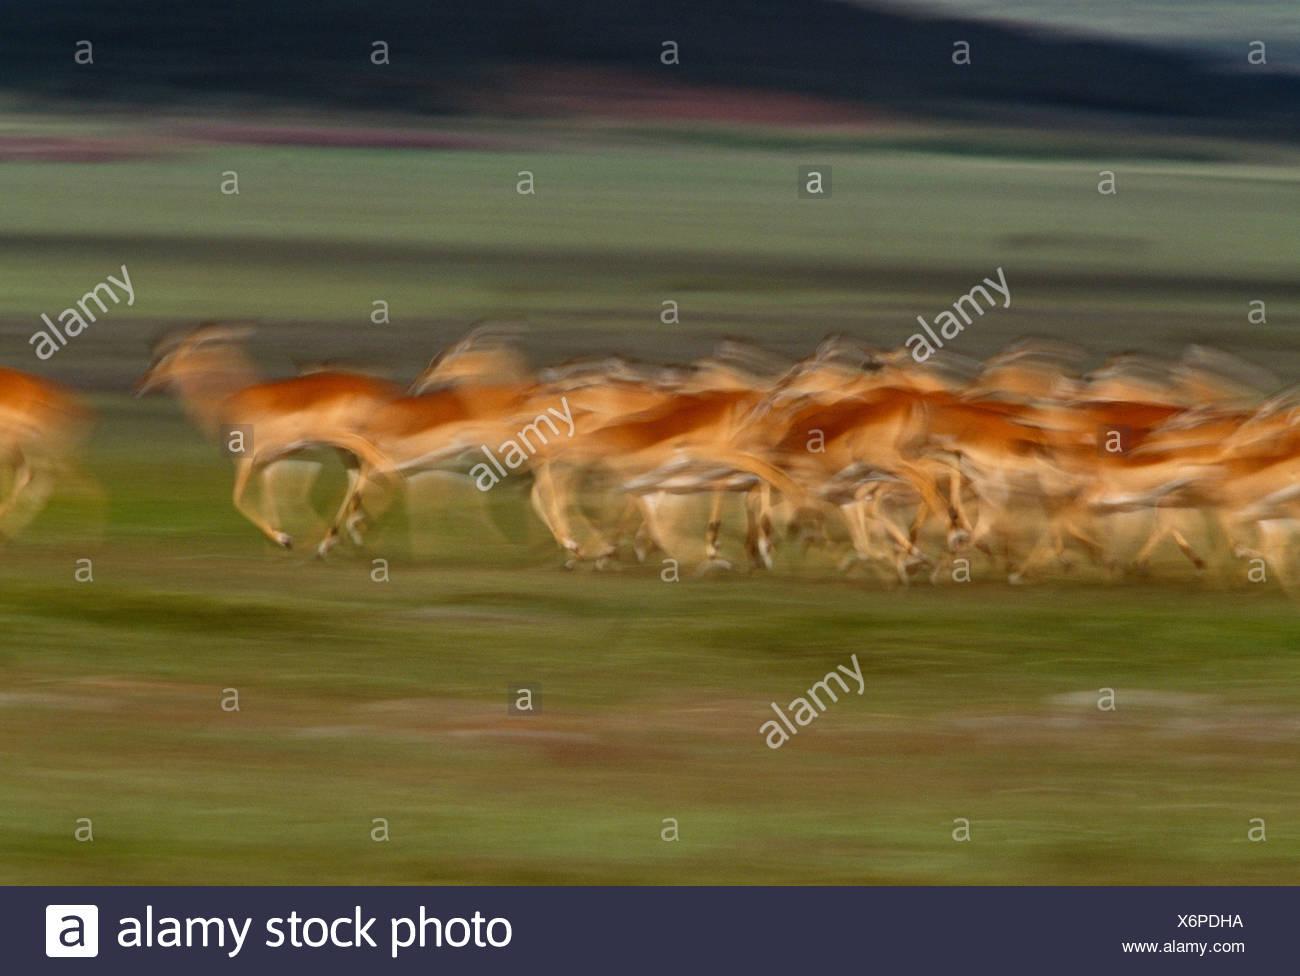 Impala herd, Masai Mara National Reserve, Kenya - Stock Image